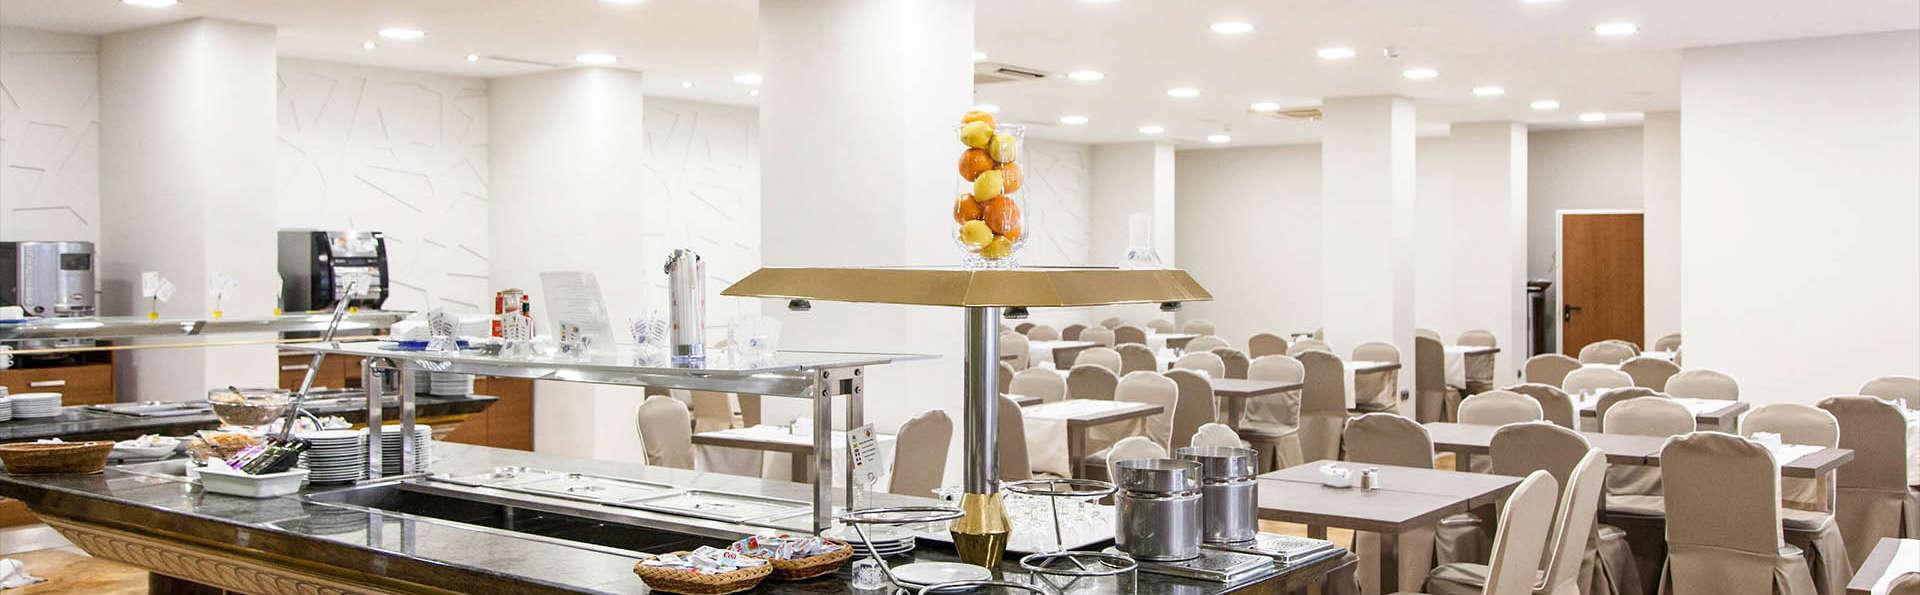 Hotel Porcel Sabica - EDIT_RESTAURANTE_03.jpg